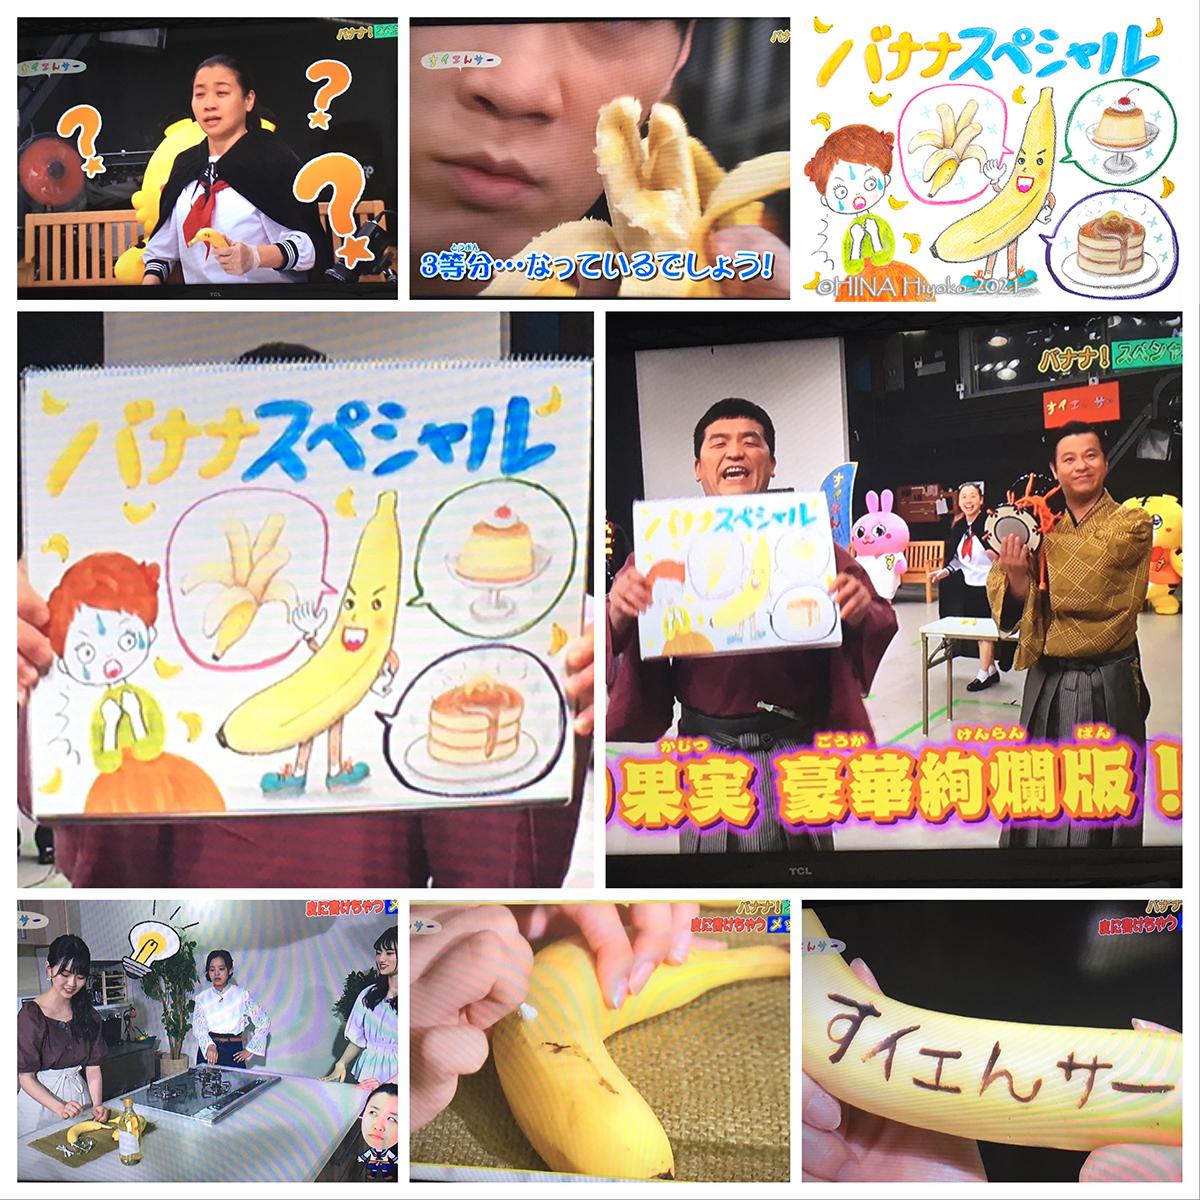 210928_banana-special_A579.jpg